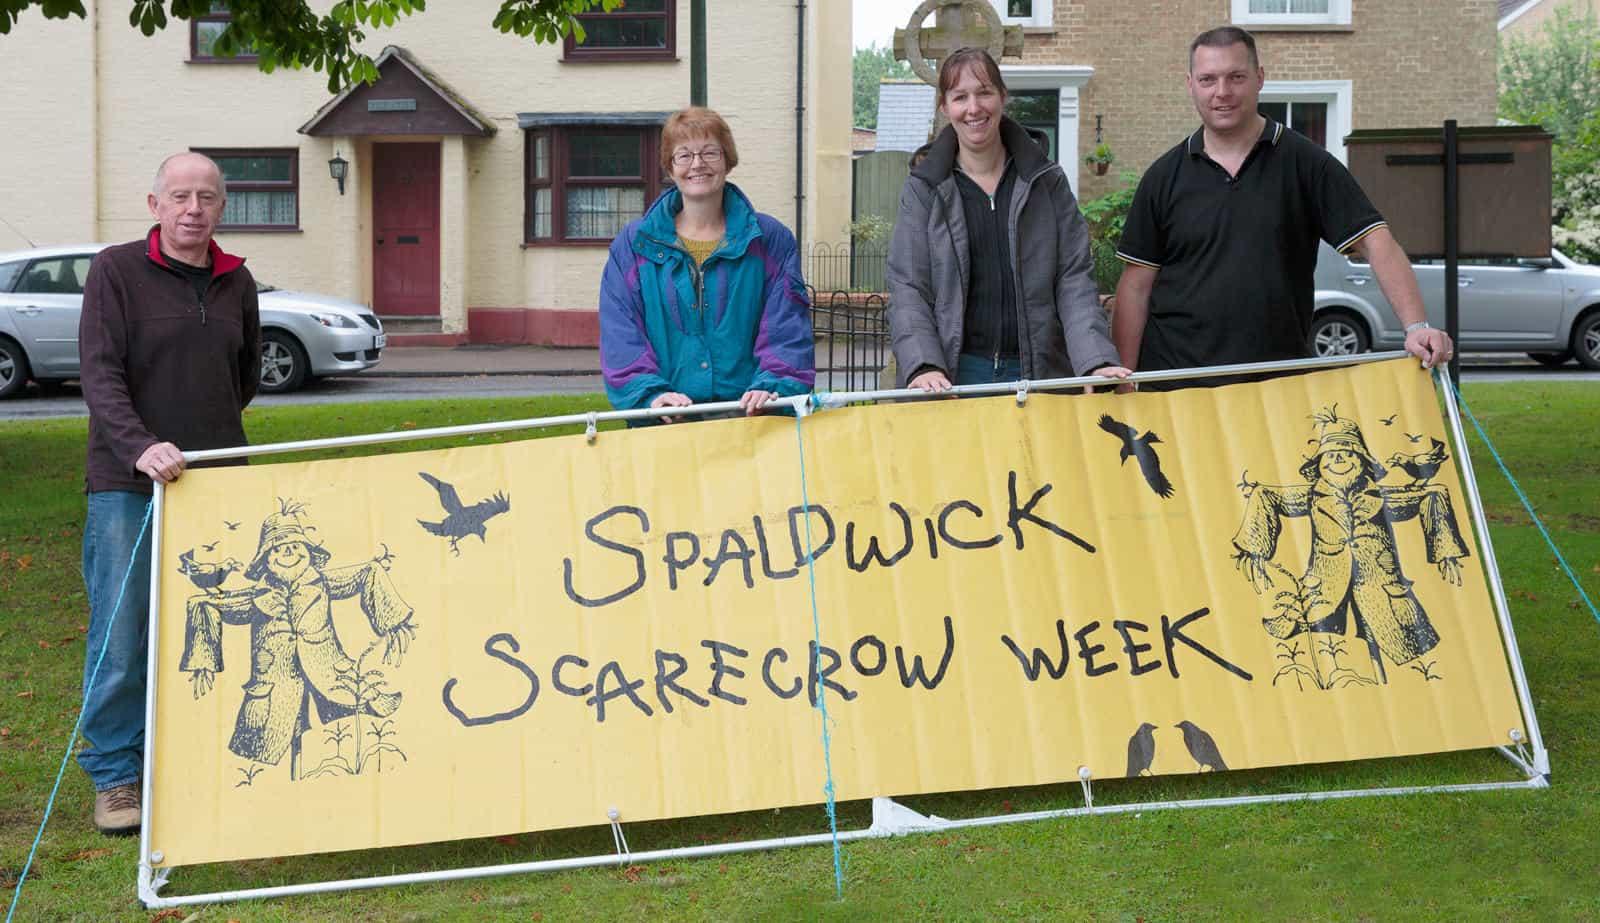 Spaldwick scarecrow advertising